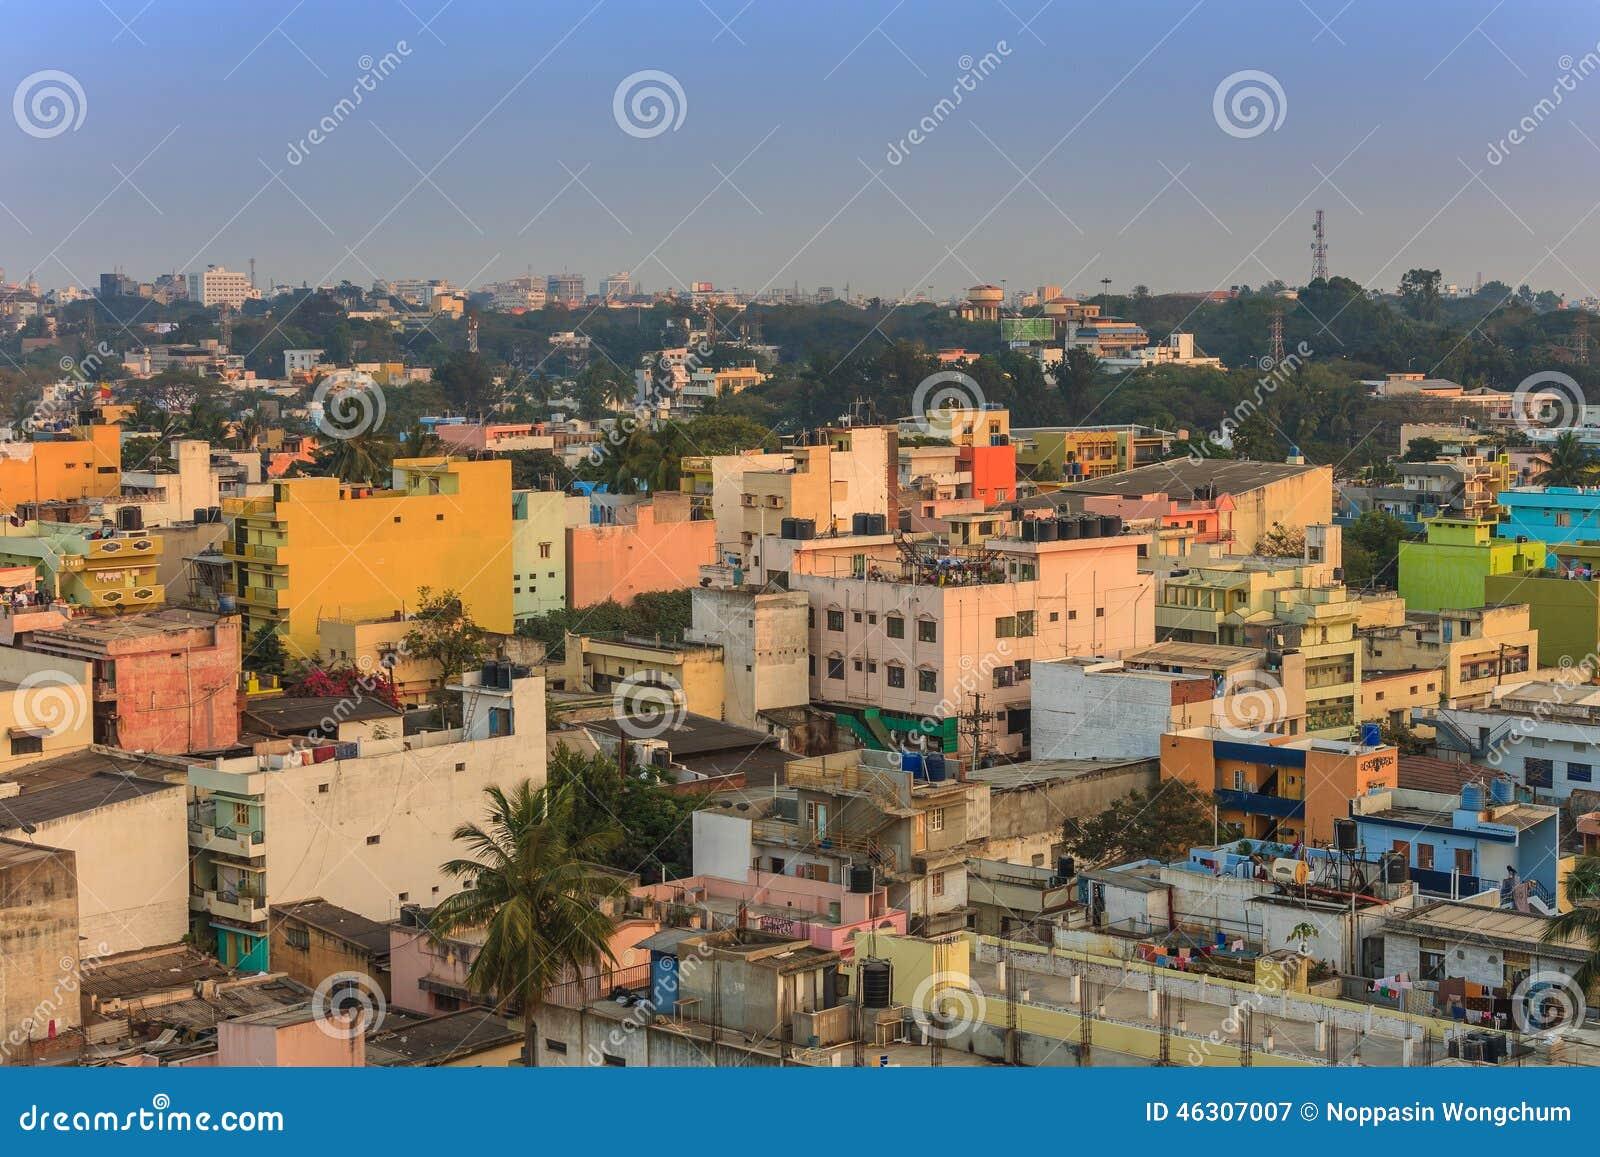 My dream city bangalore